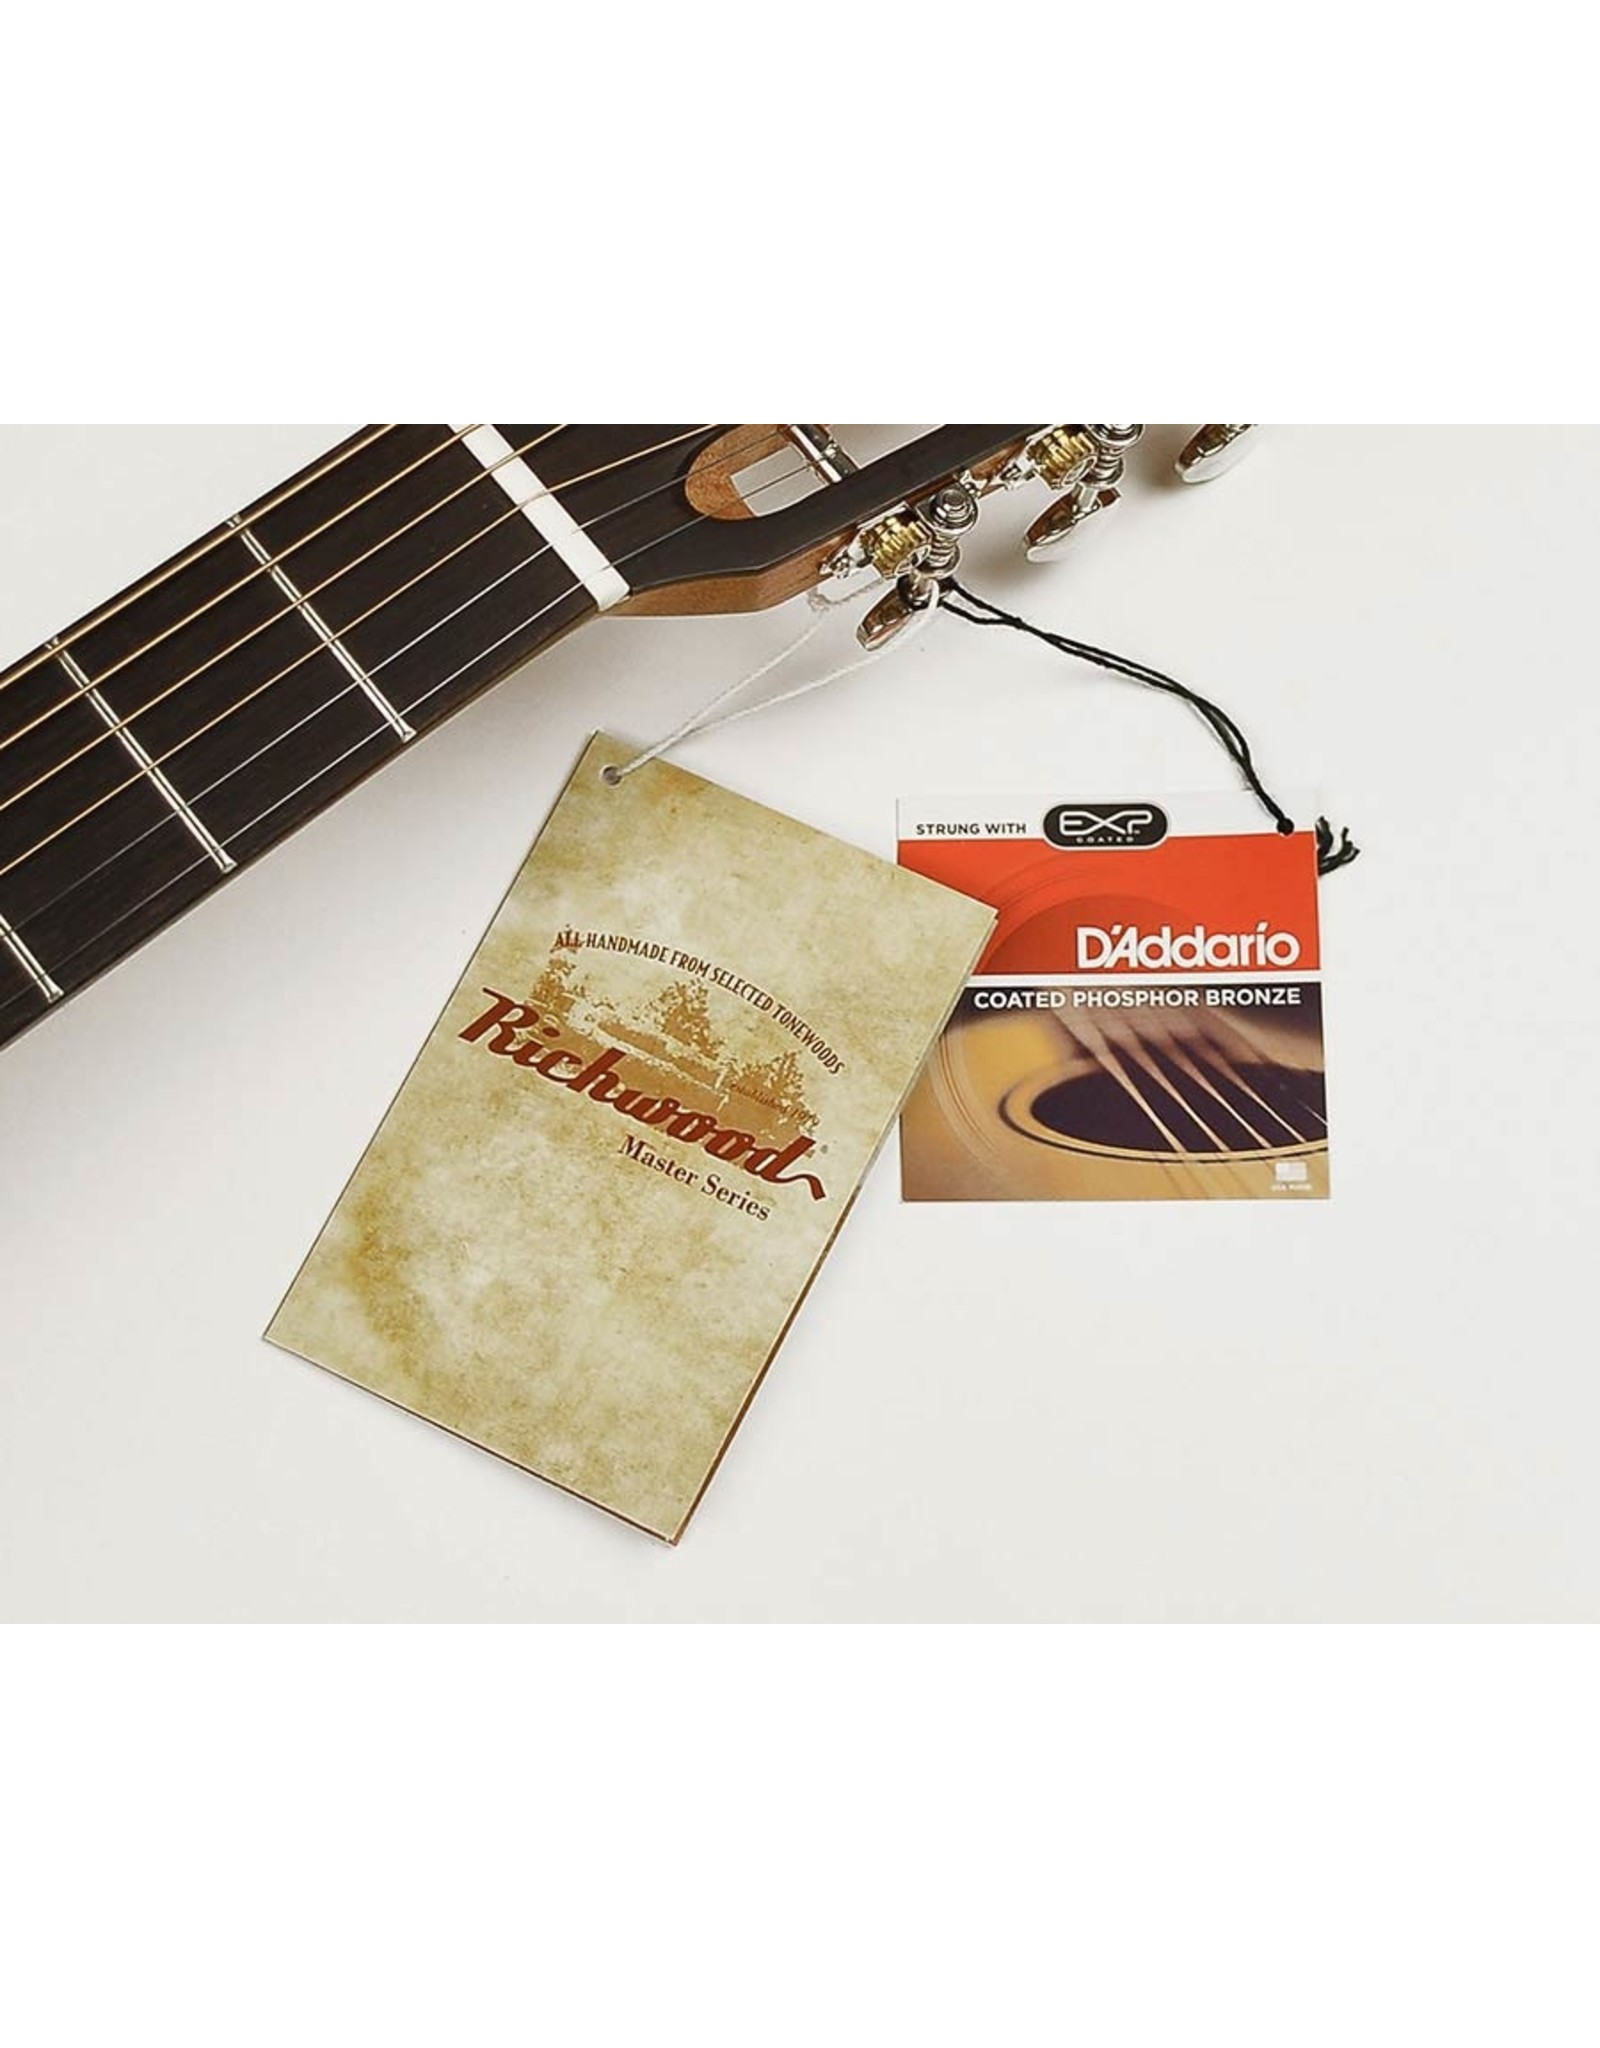 Richwood Richwood P-40 parlor gitaar